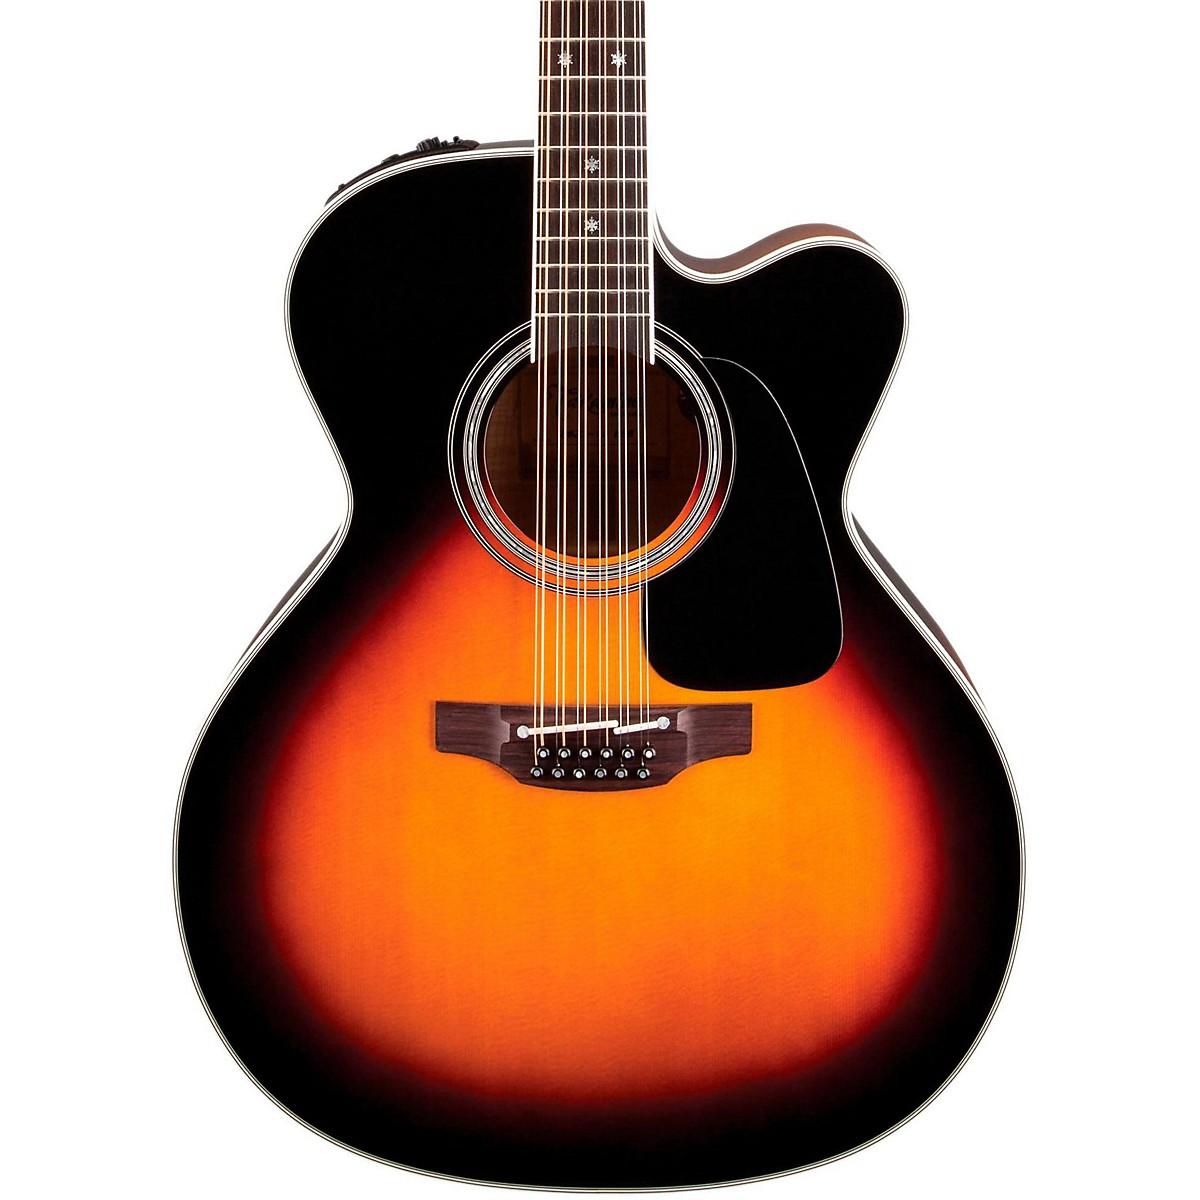 Takamine Pro Series 6 Jumbo Cutaway 12-String Acoustic-Electric Guitar